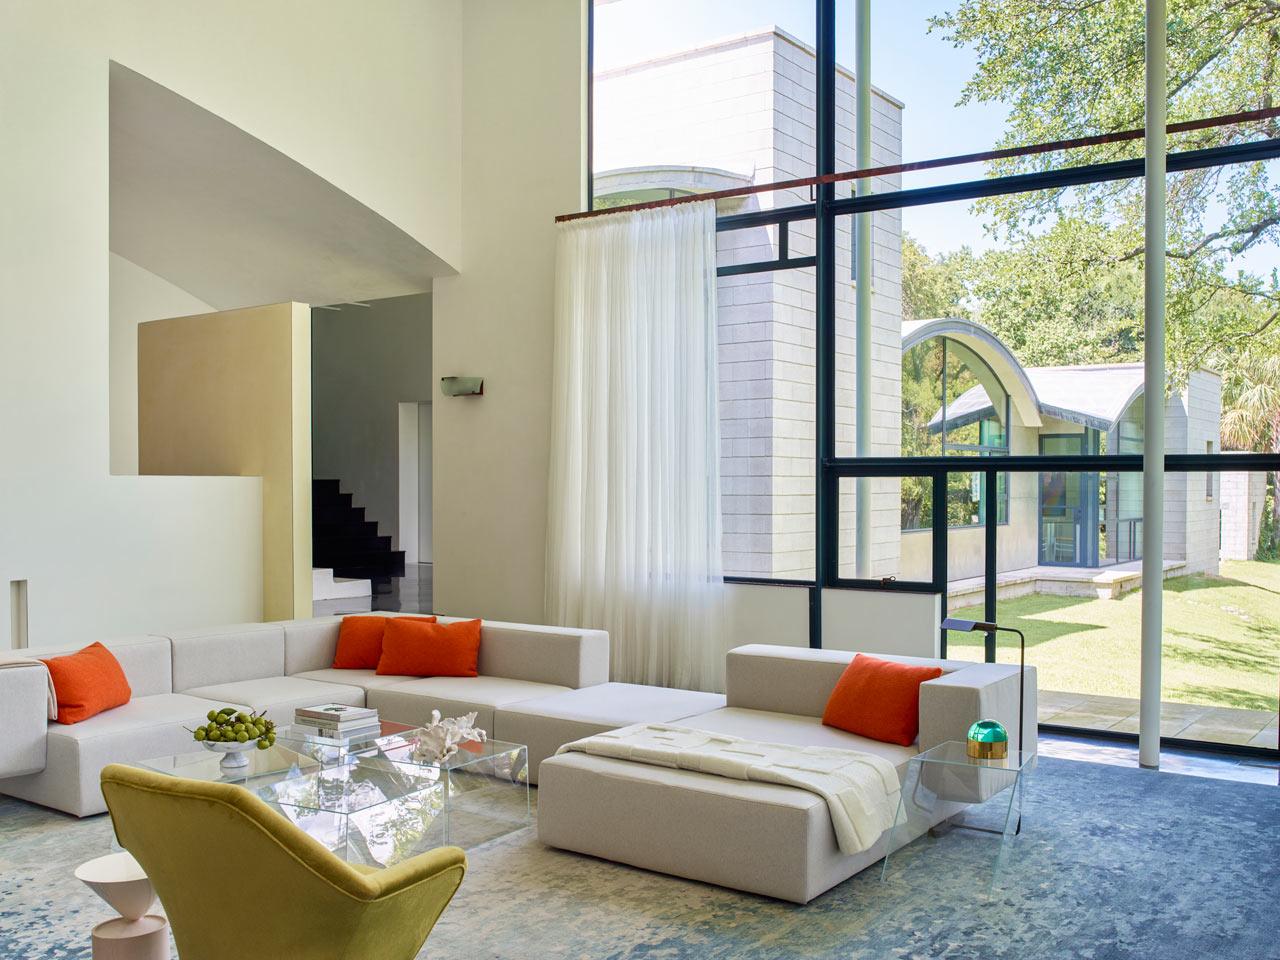 Stretto-Residence-Emily-Summers-1.jpg